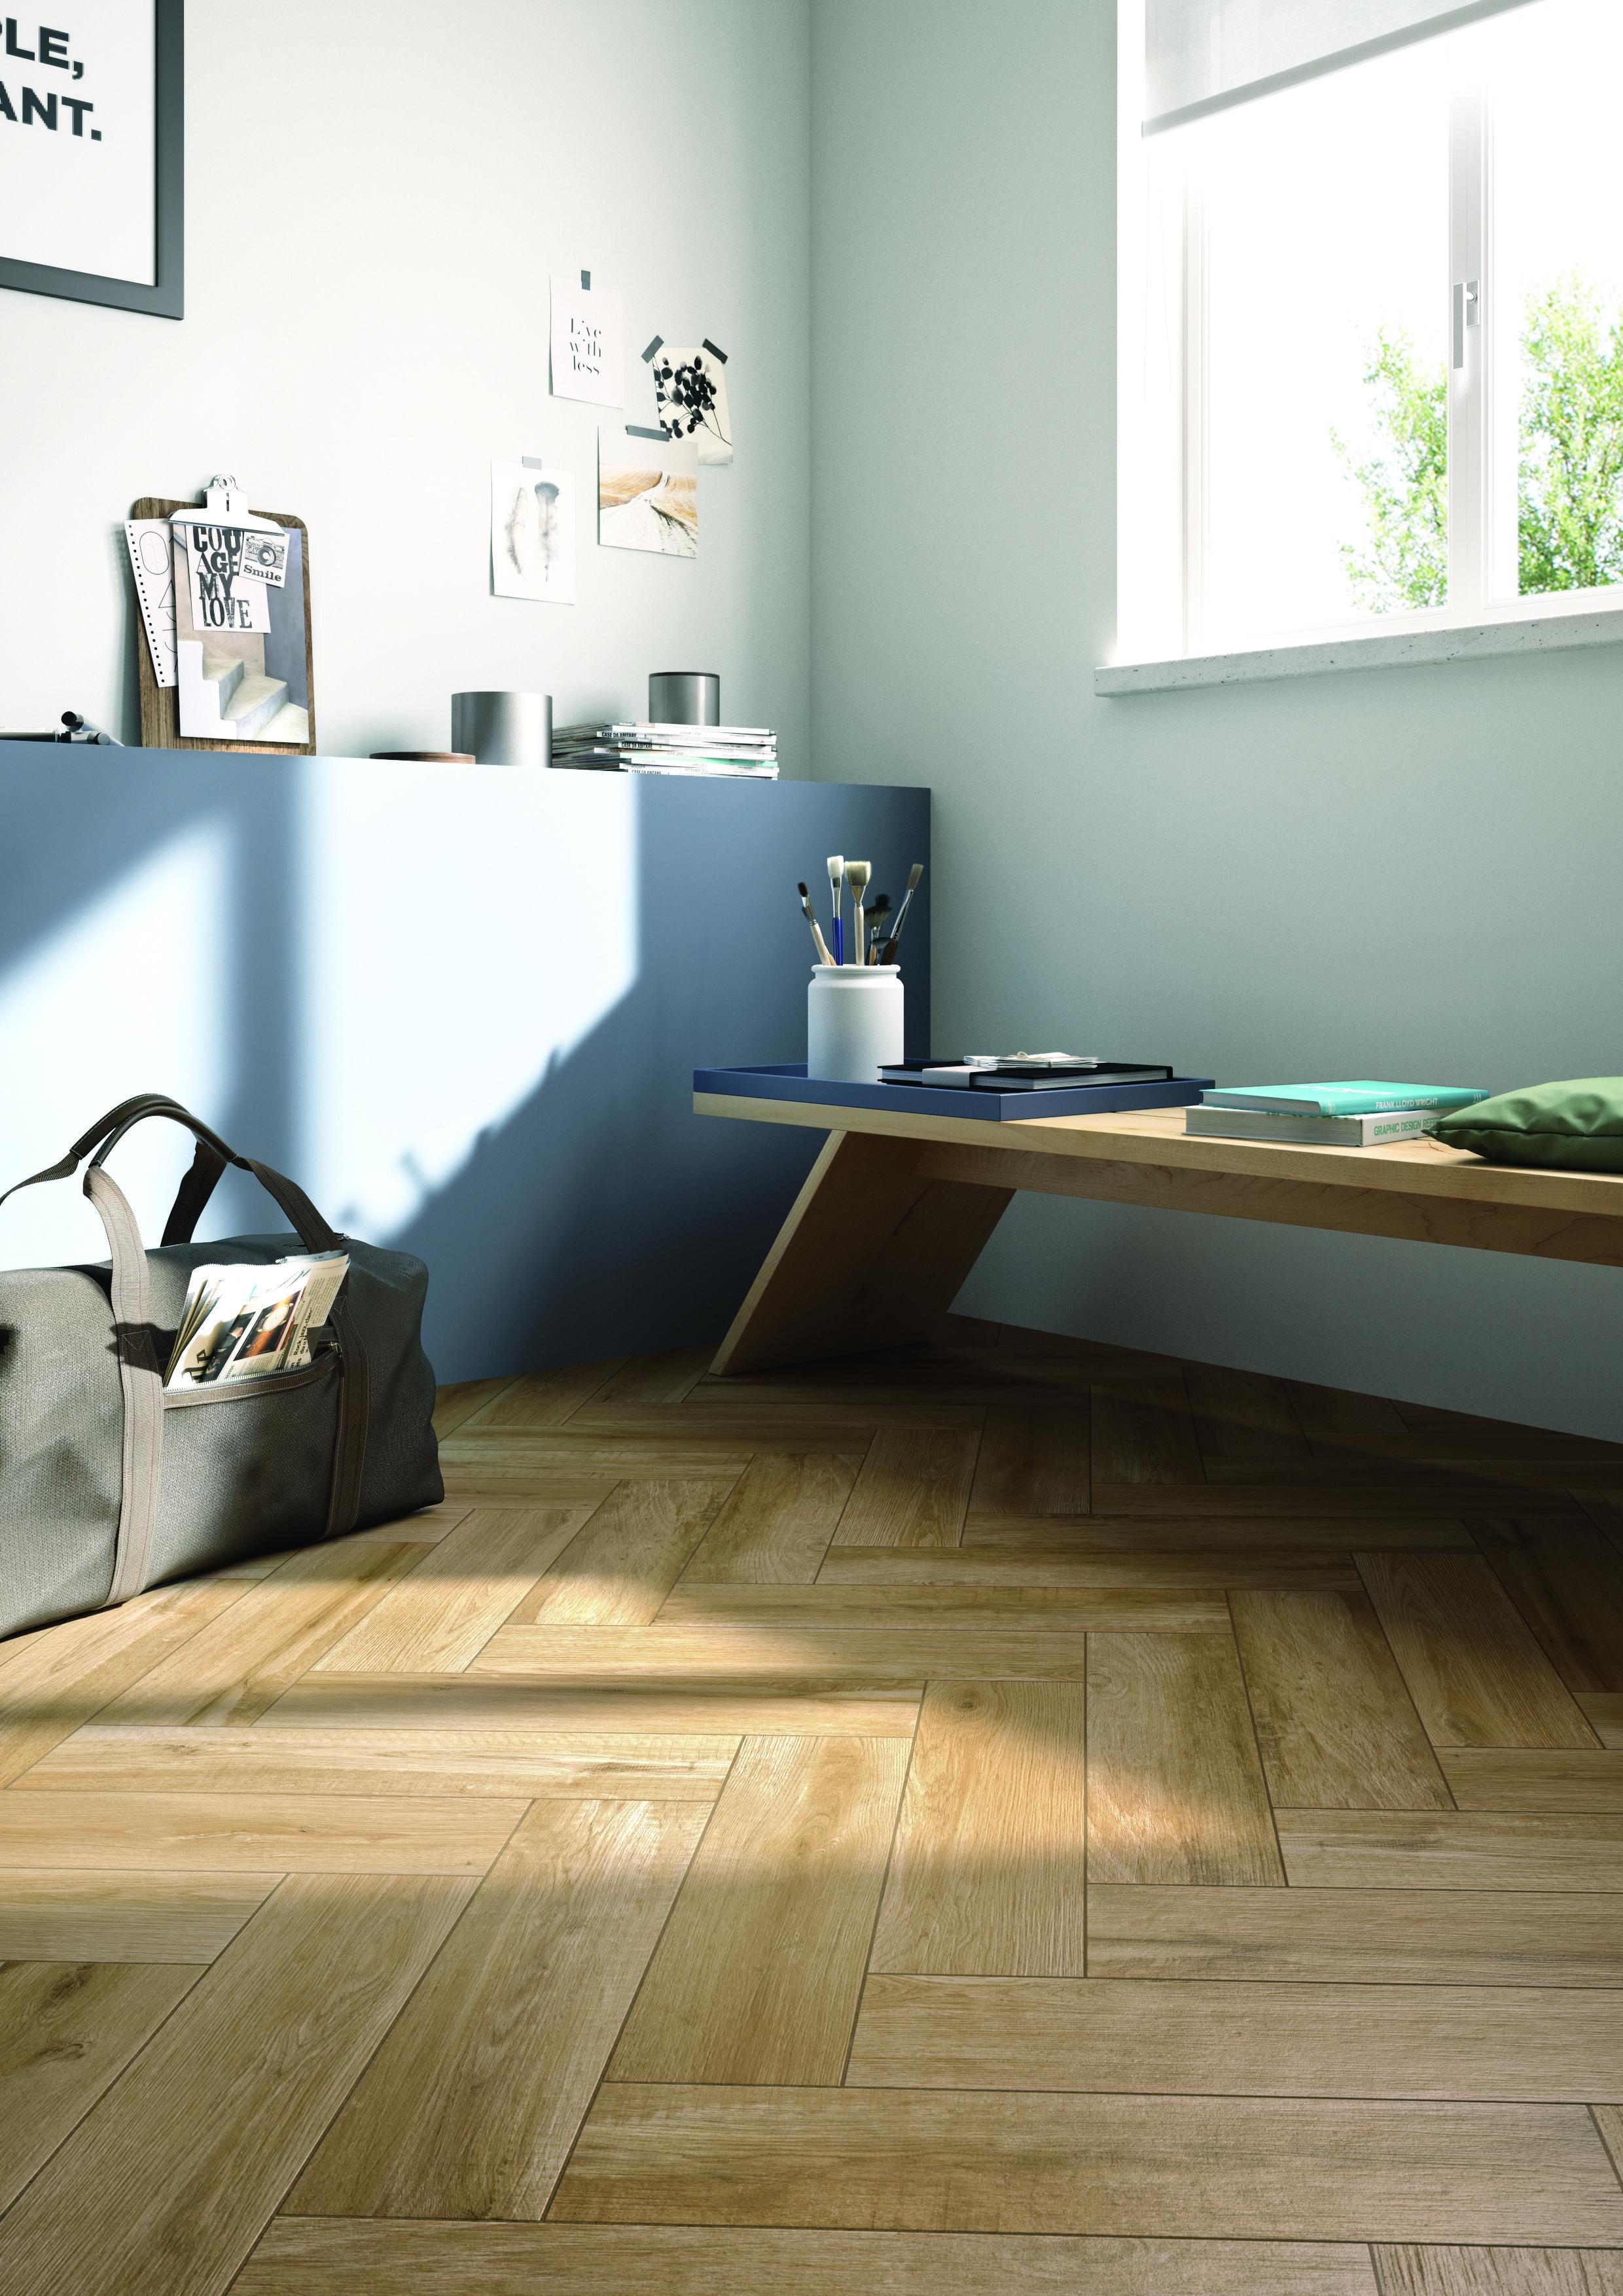 Ragno Fliesen Freetime Gurin Pinterest Boden Interiors And House - Ragno fliesen katalog